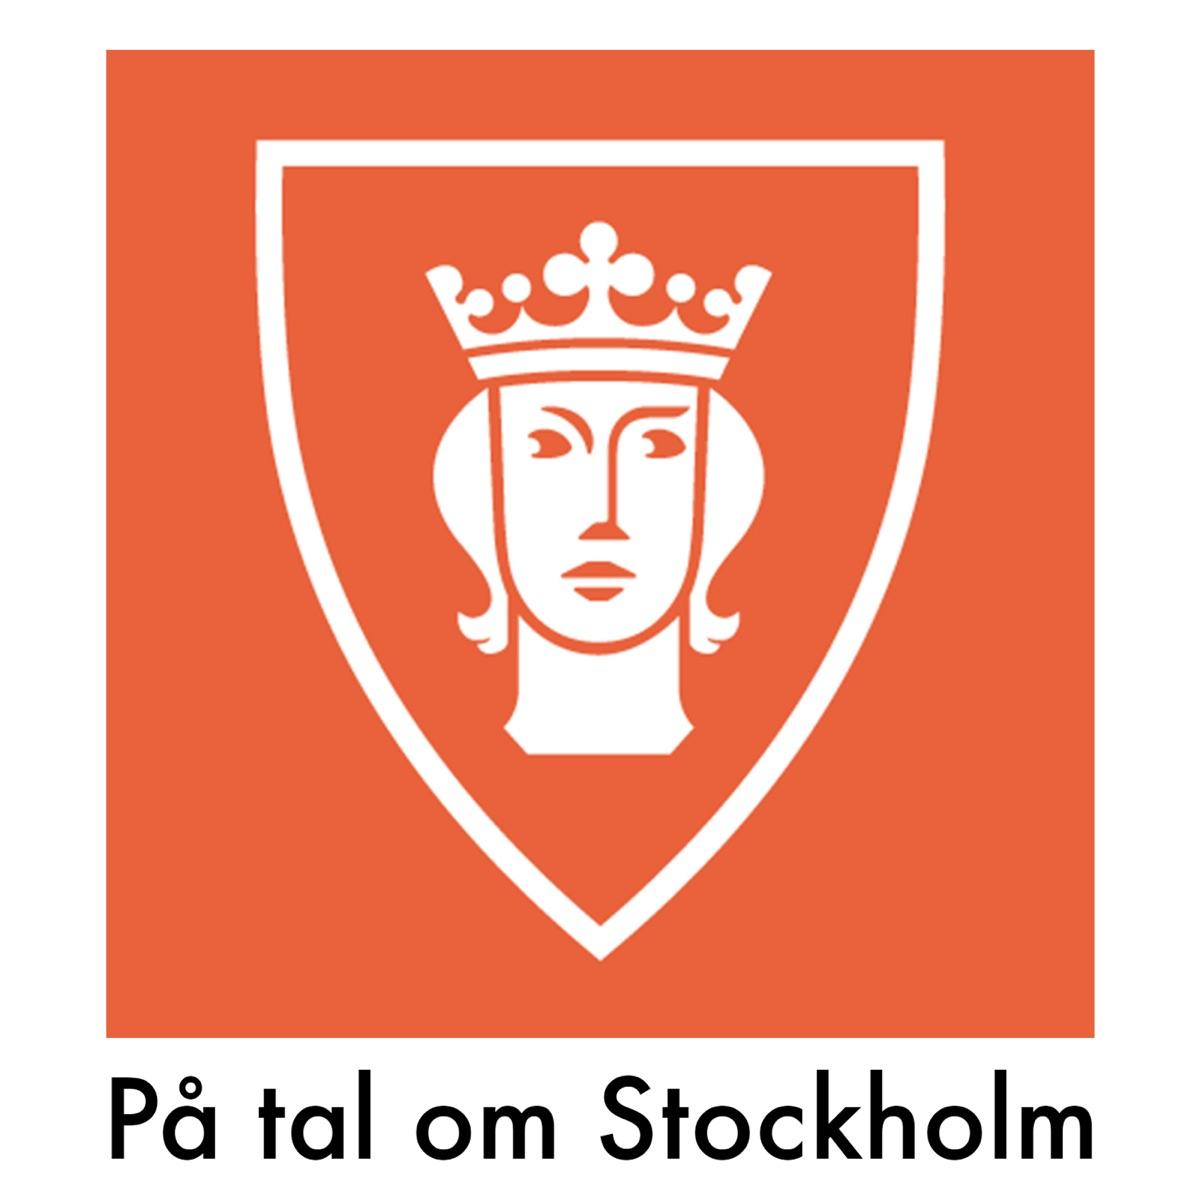 Nr 23: Inventering av Stockholms parker